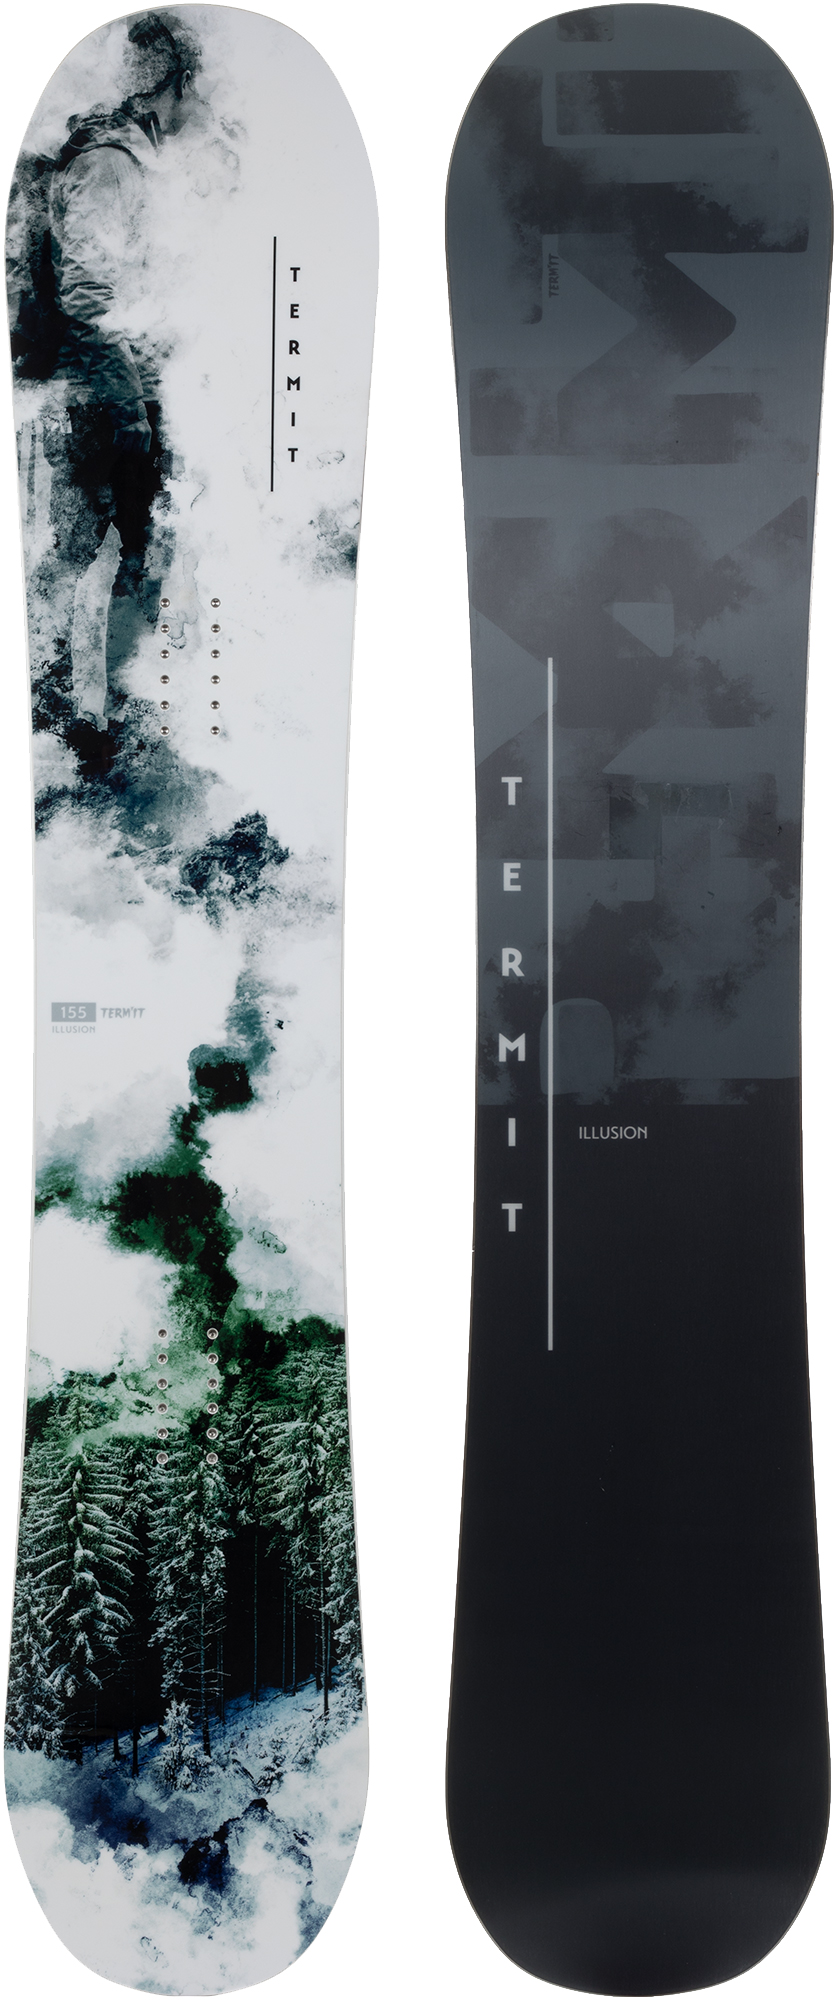 Termit Illusionw (18/19) цены онлайн